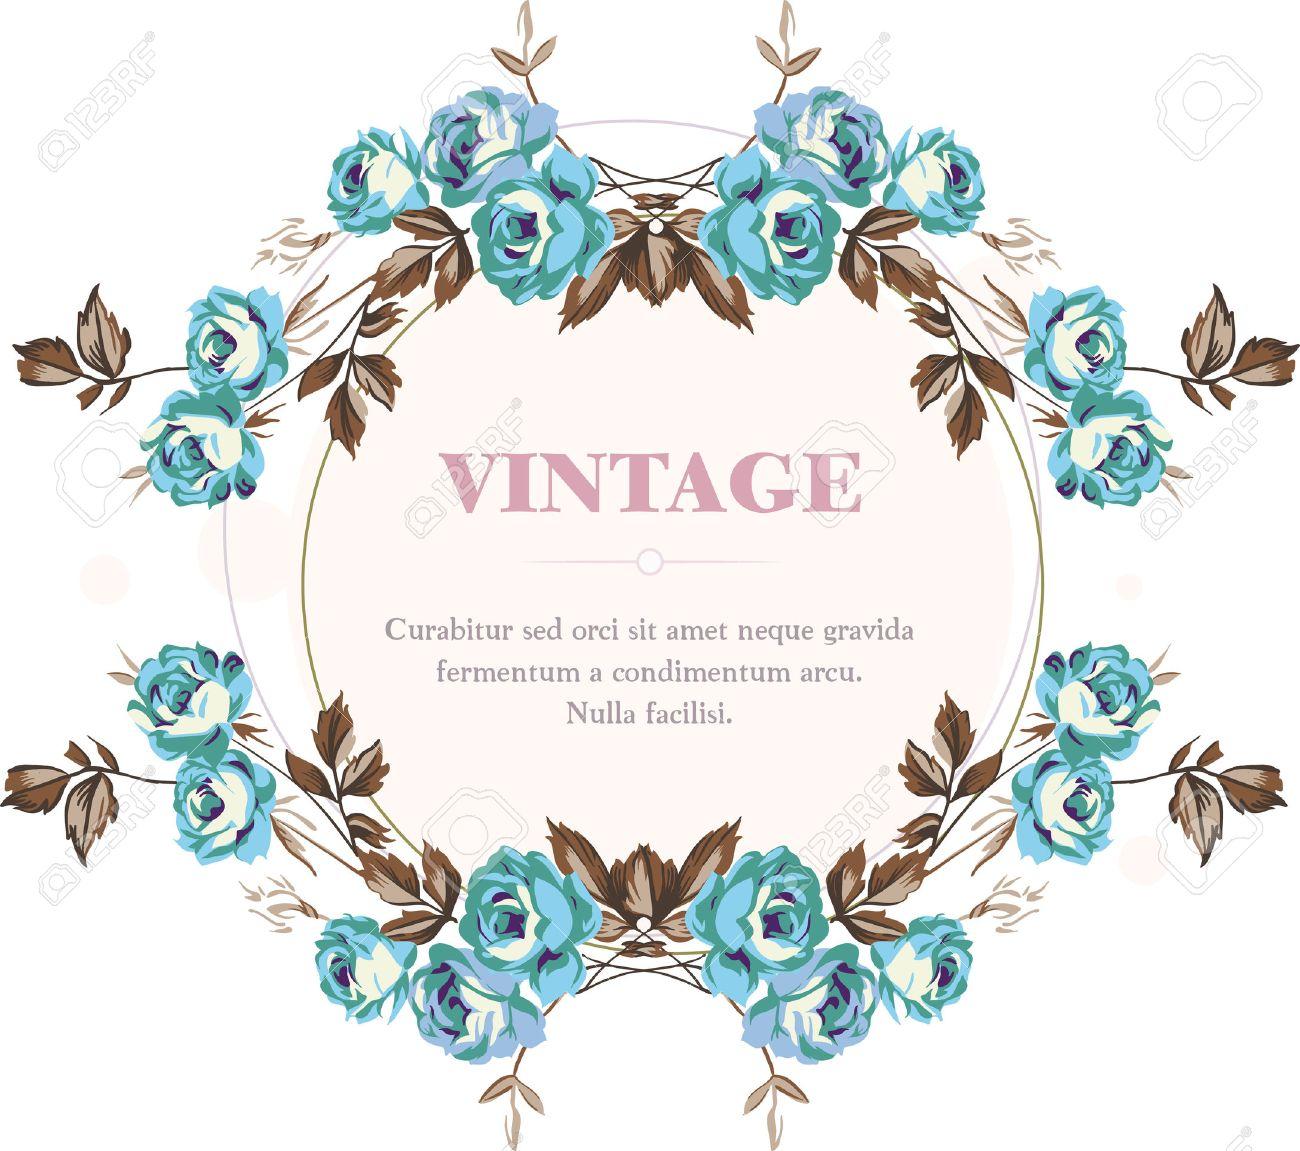 Vintage style shabby roses vector frame Stock Vector - 23394017